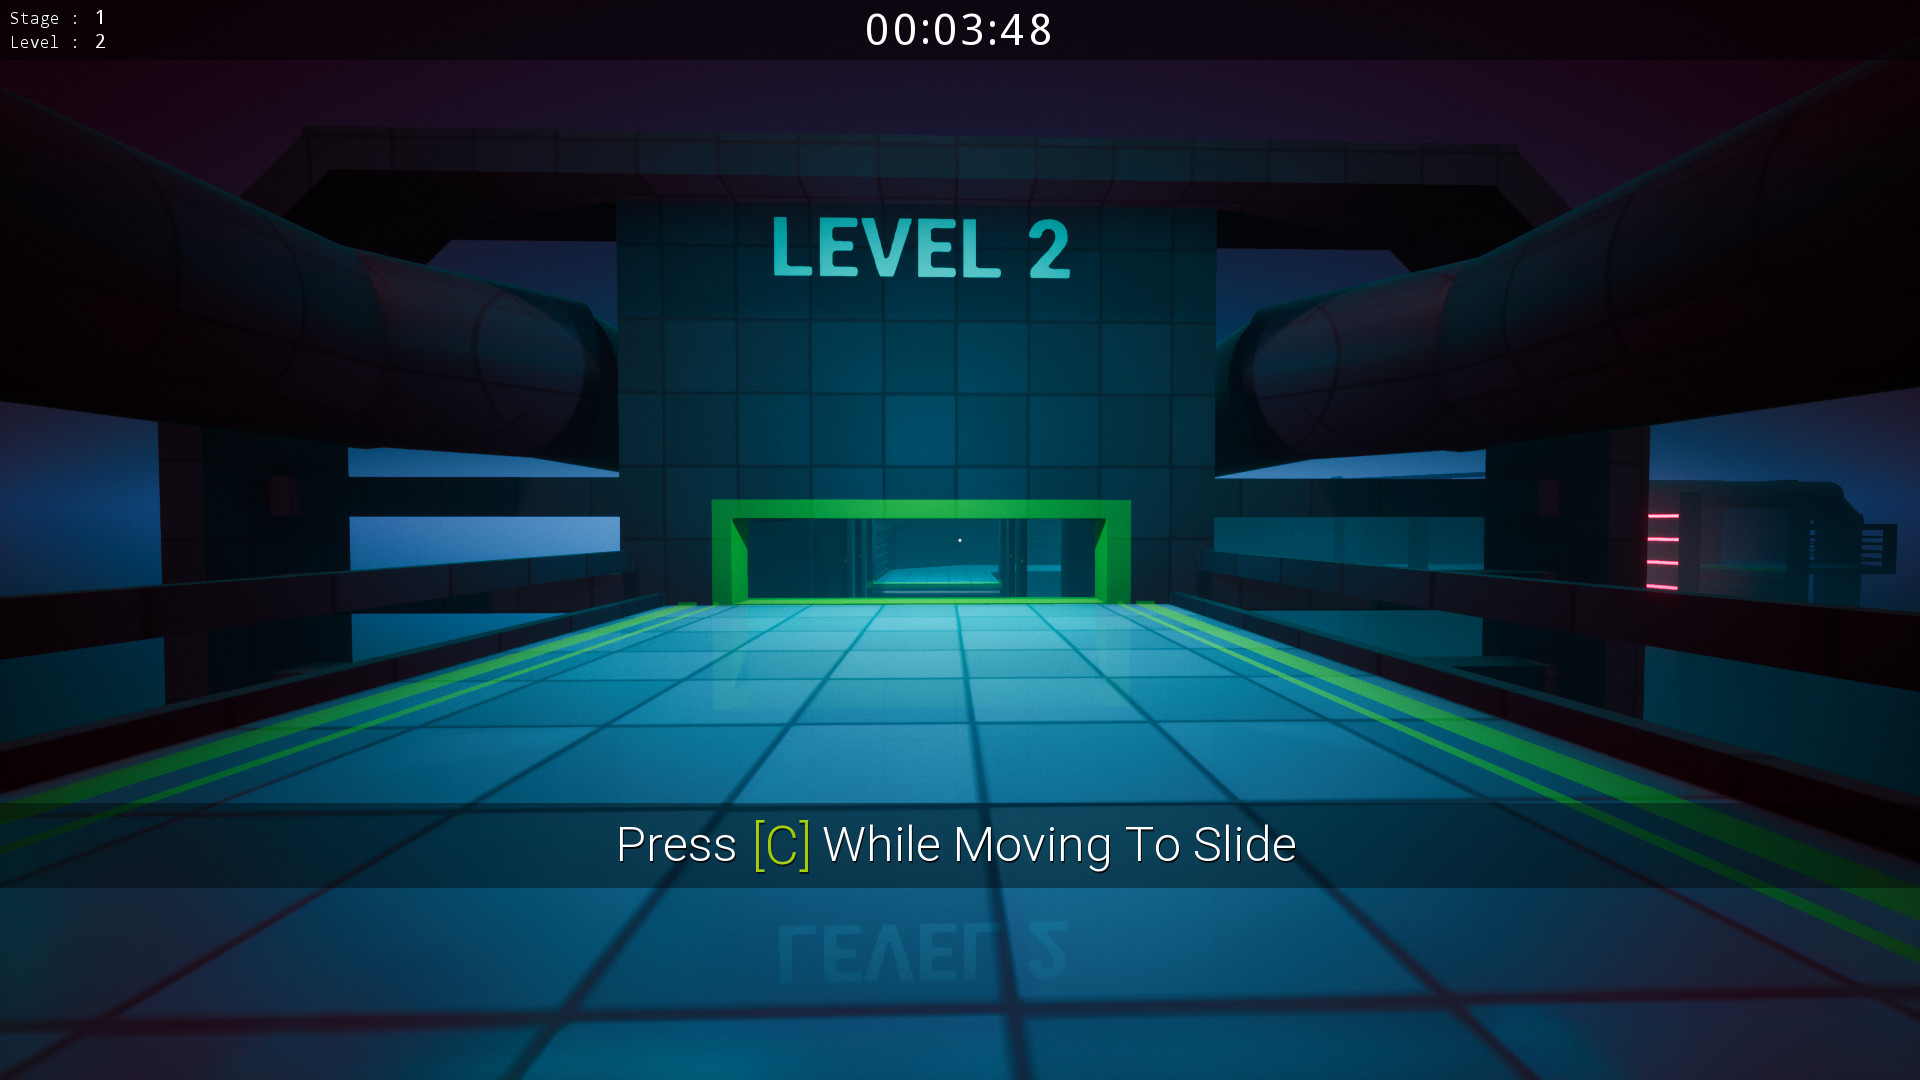 A ninja in training screenshot